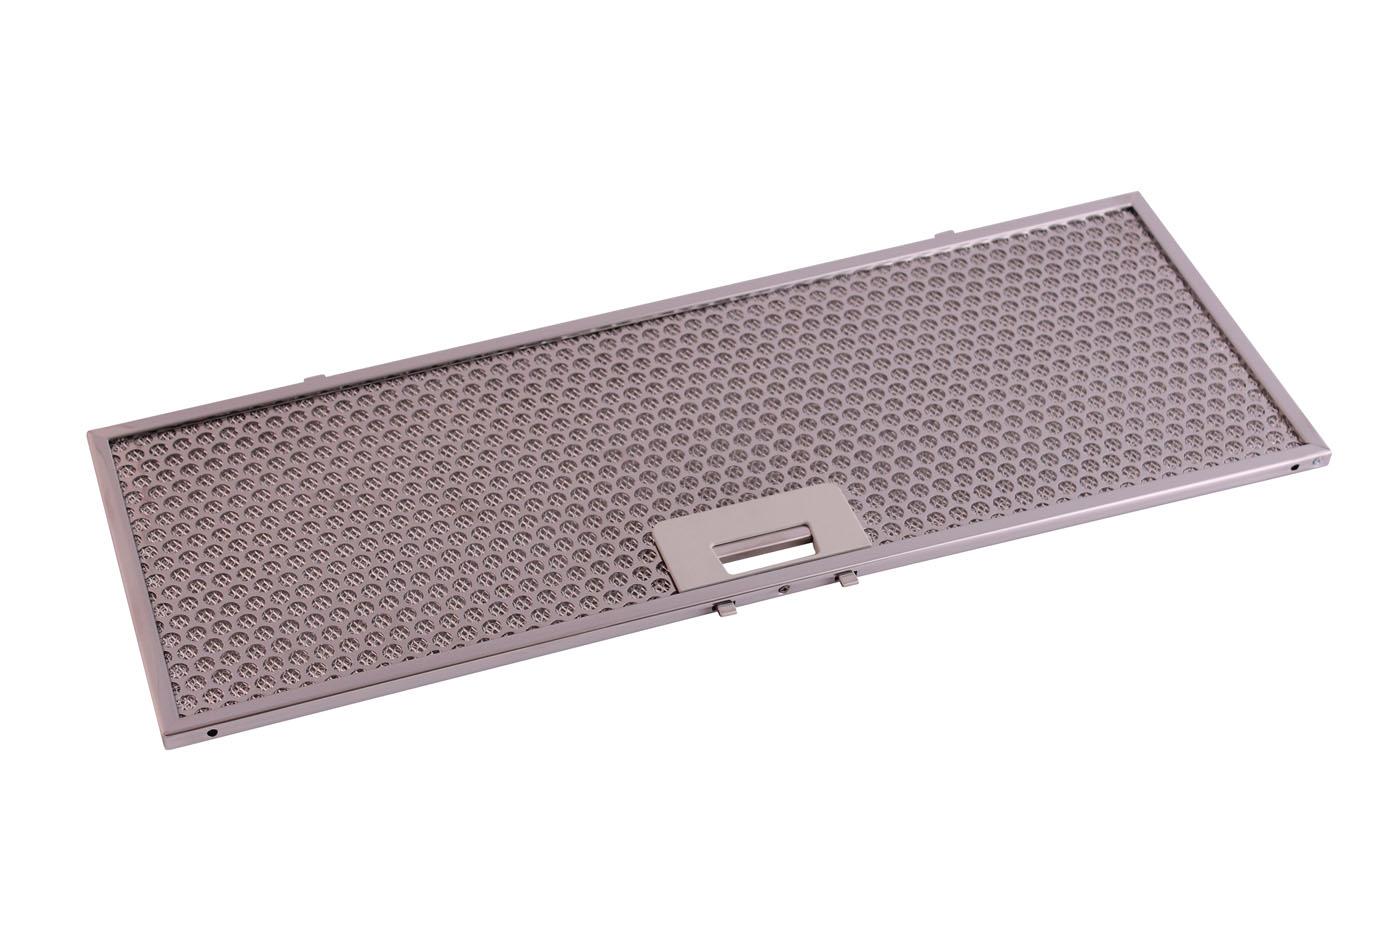 Novy aluminium filter 500 x 185 mm voor afzuigkap 508-90088